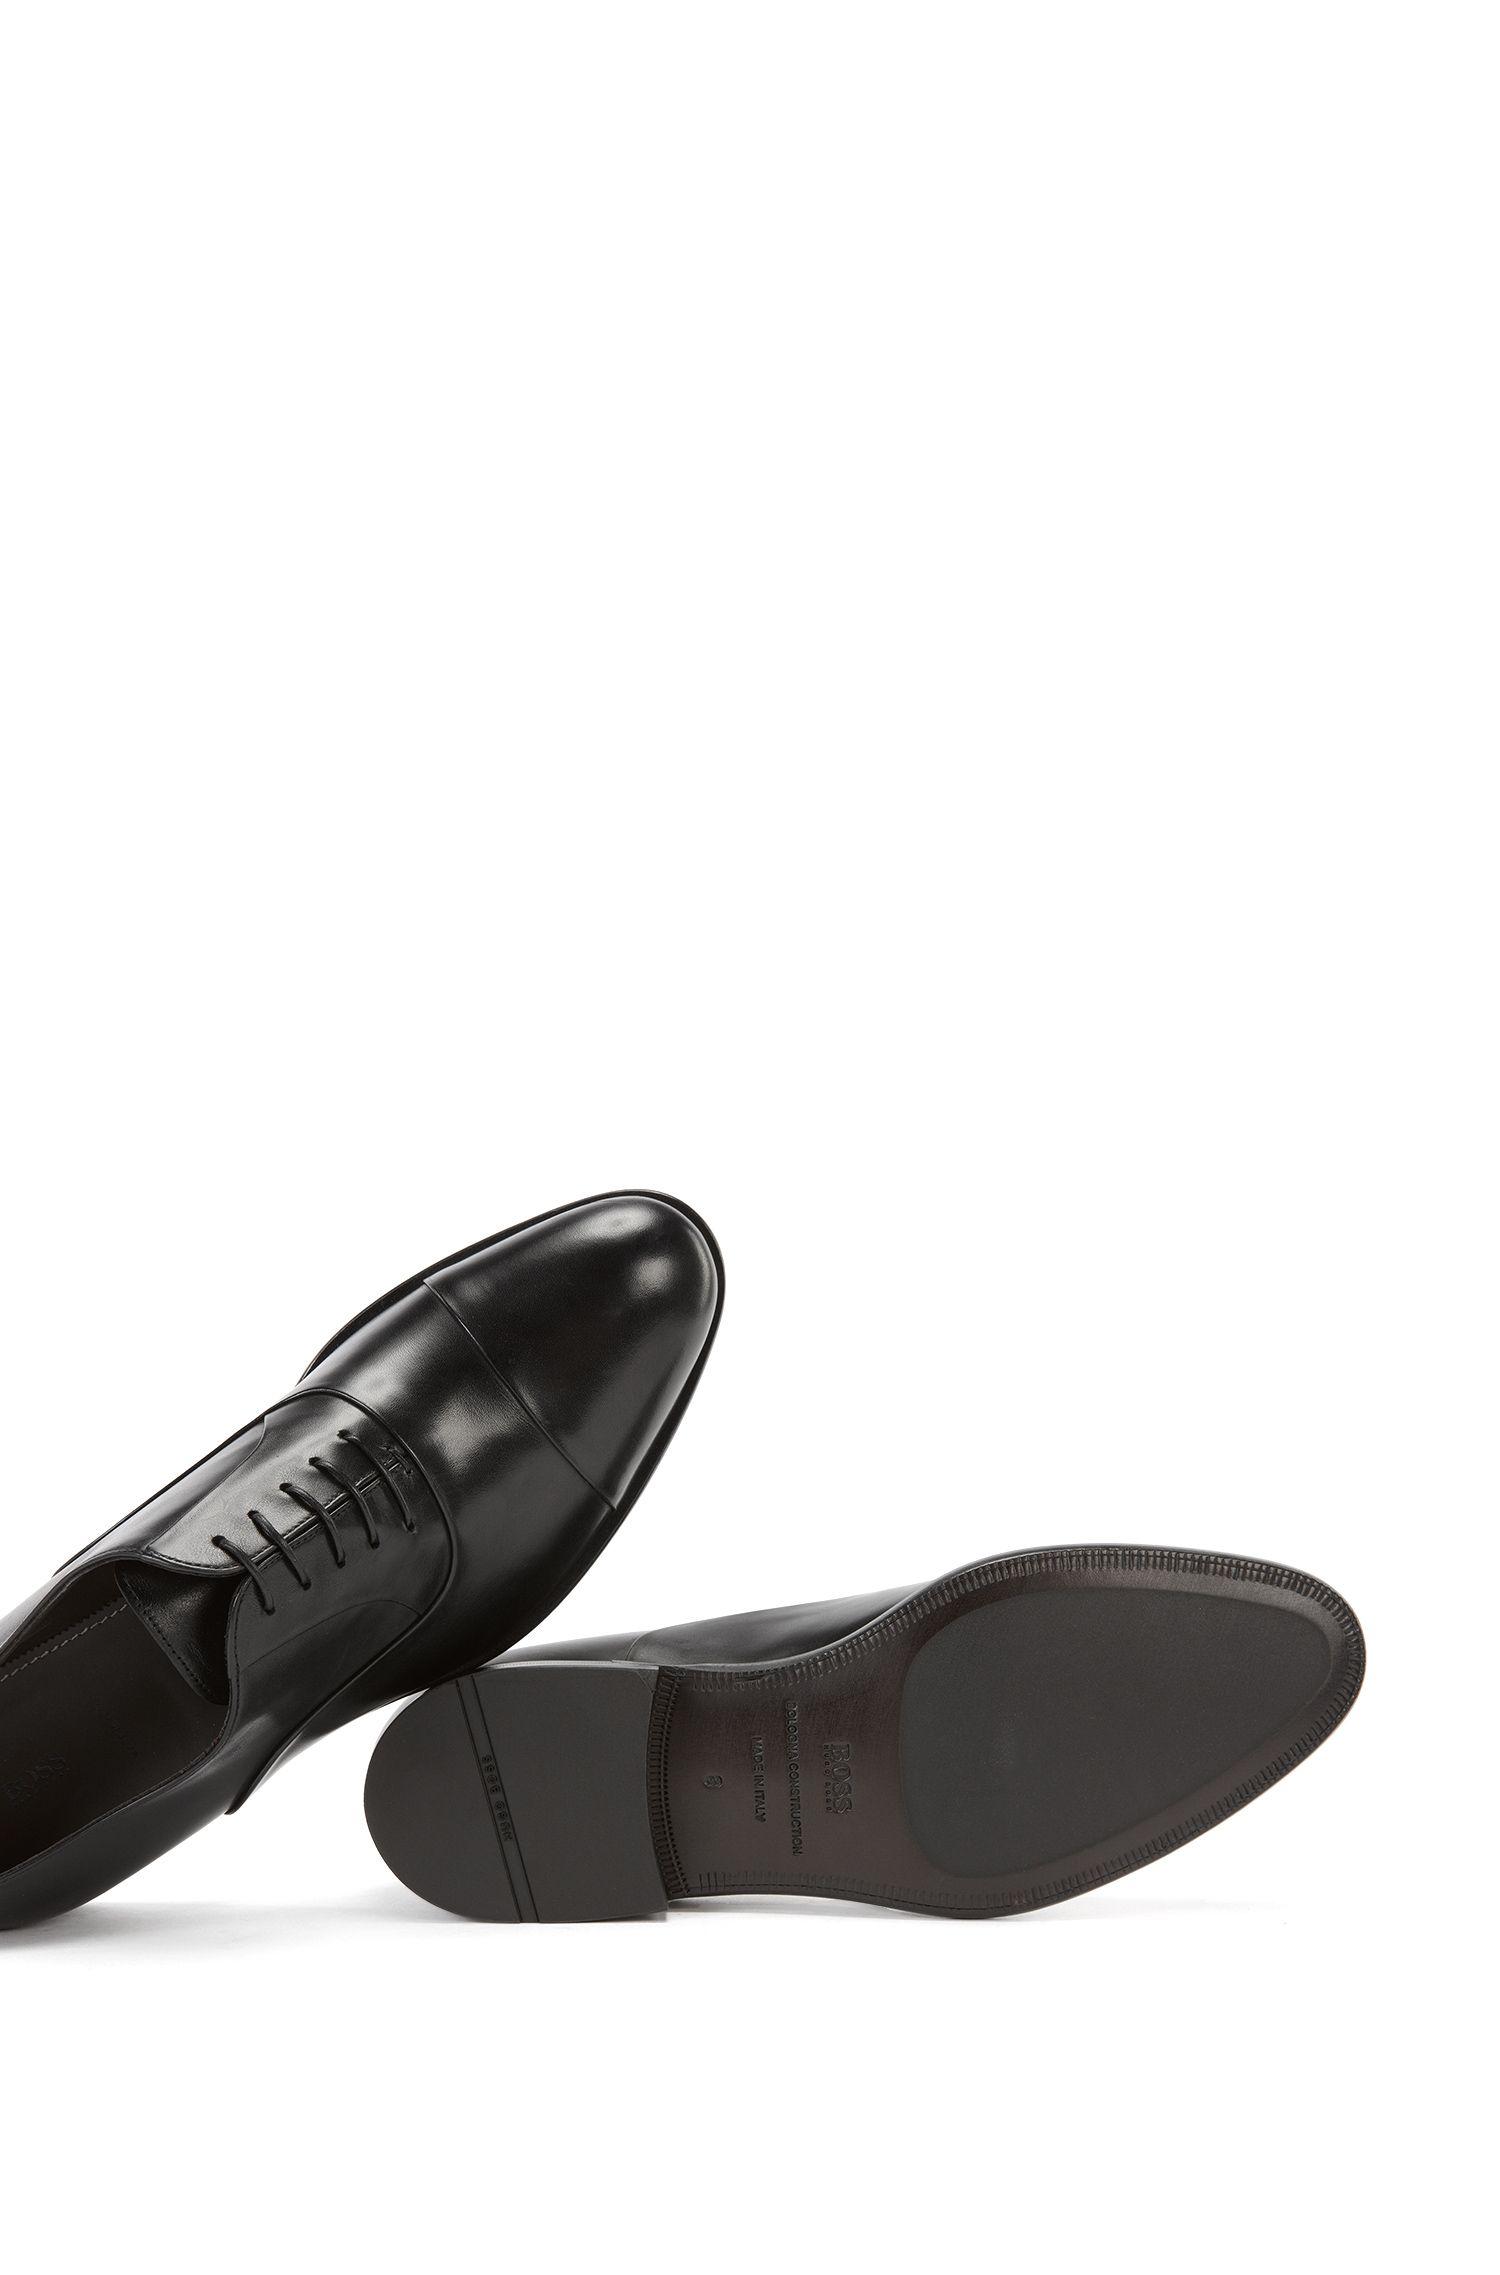 Oxford Dress Shoe   Bristol Oxfr Ctst, Black